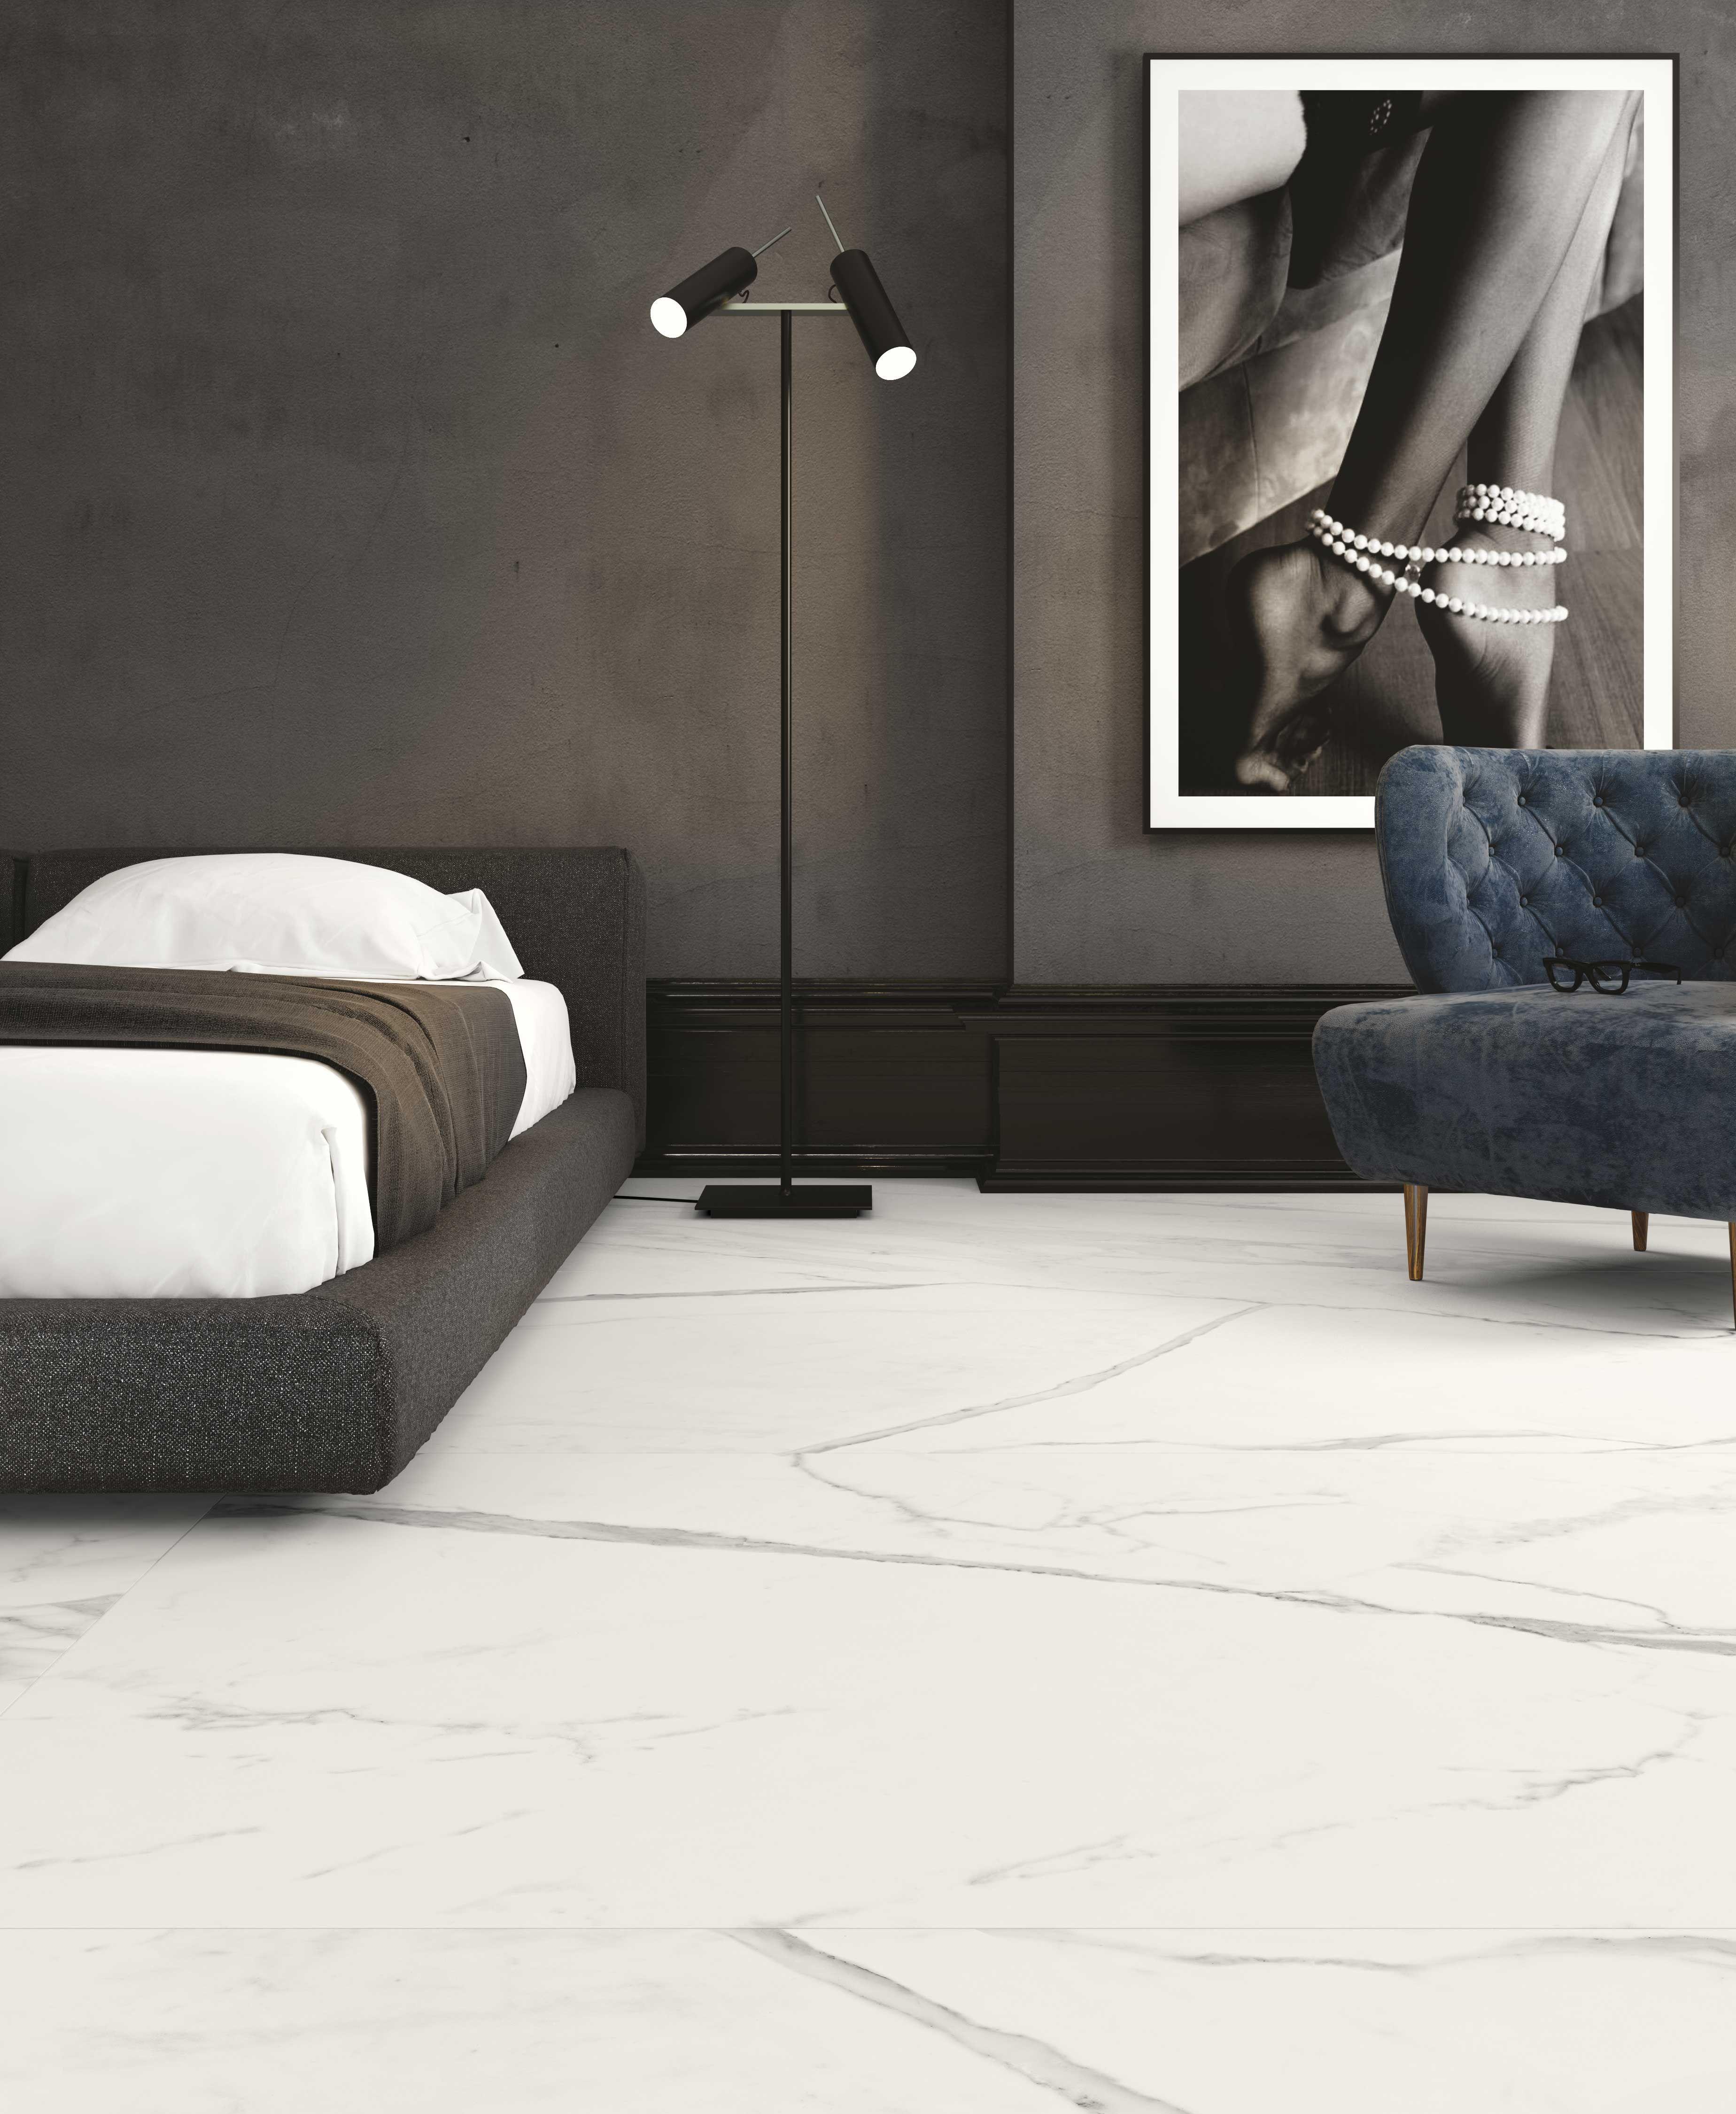 Modern Bedroom Designed Using Everstone Tiles Tile Bedroom Modern Living Room Interior Wall And Floor Tiles